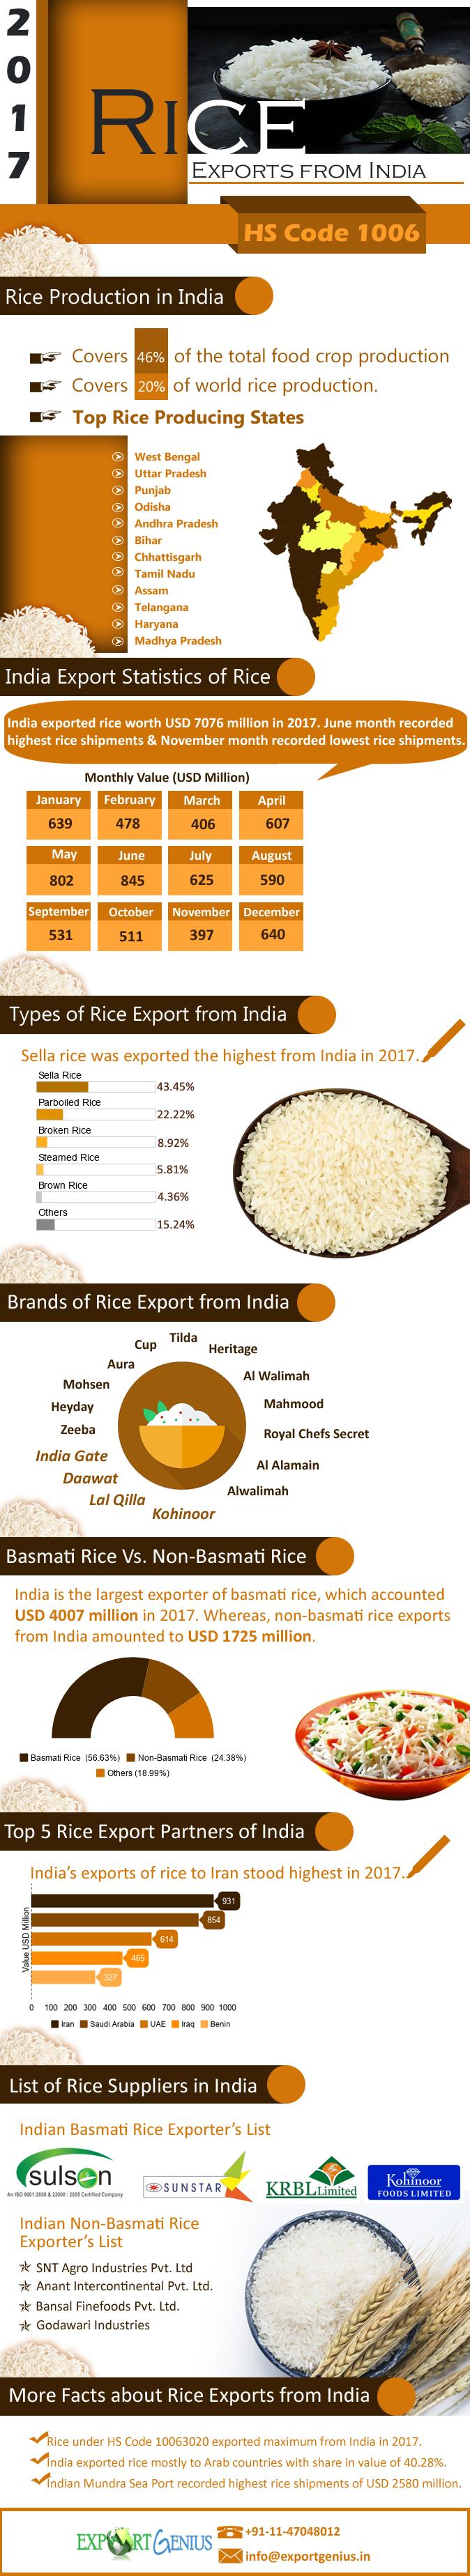 Rice Exports Data